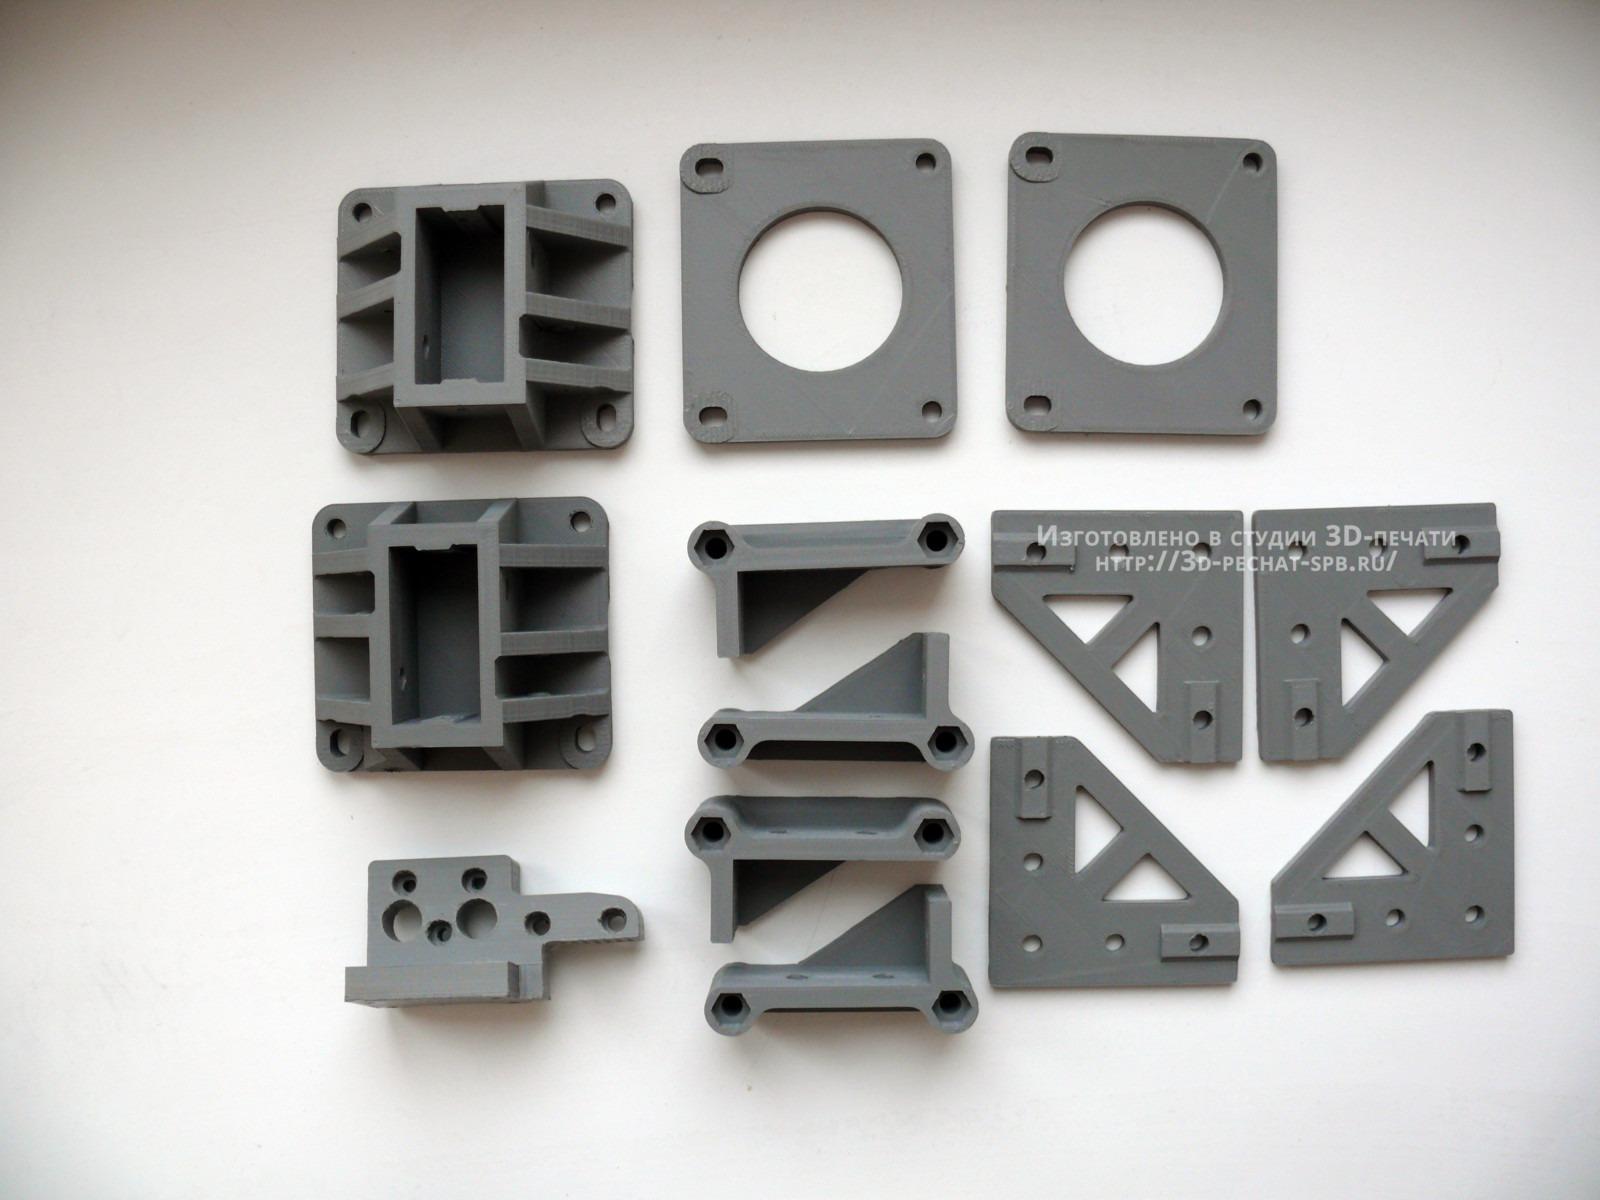 Запчасти для 3D-принтера D-bot_Core-XY